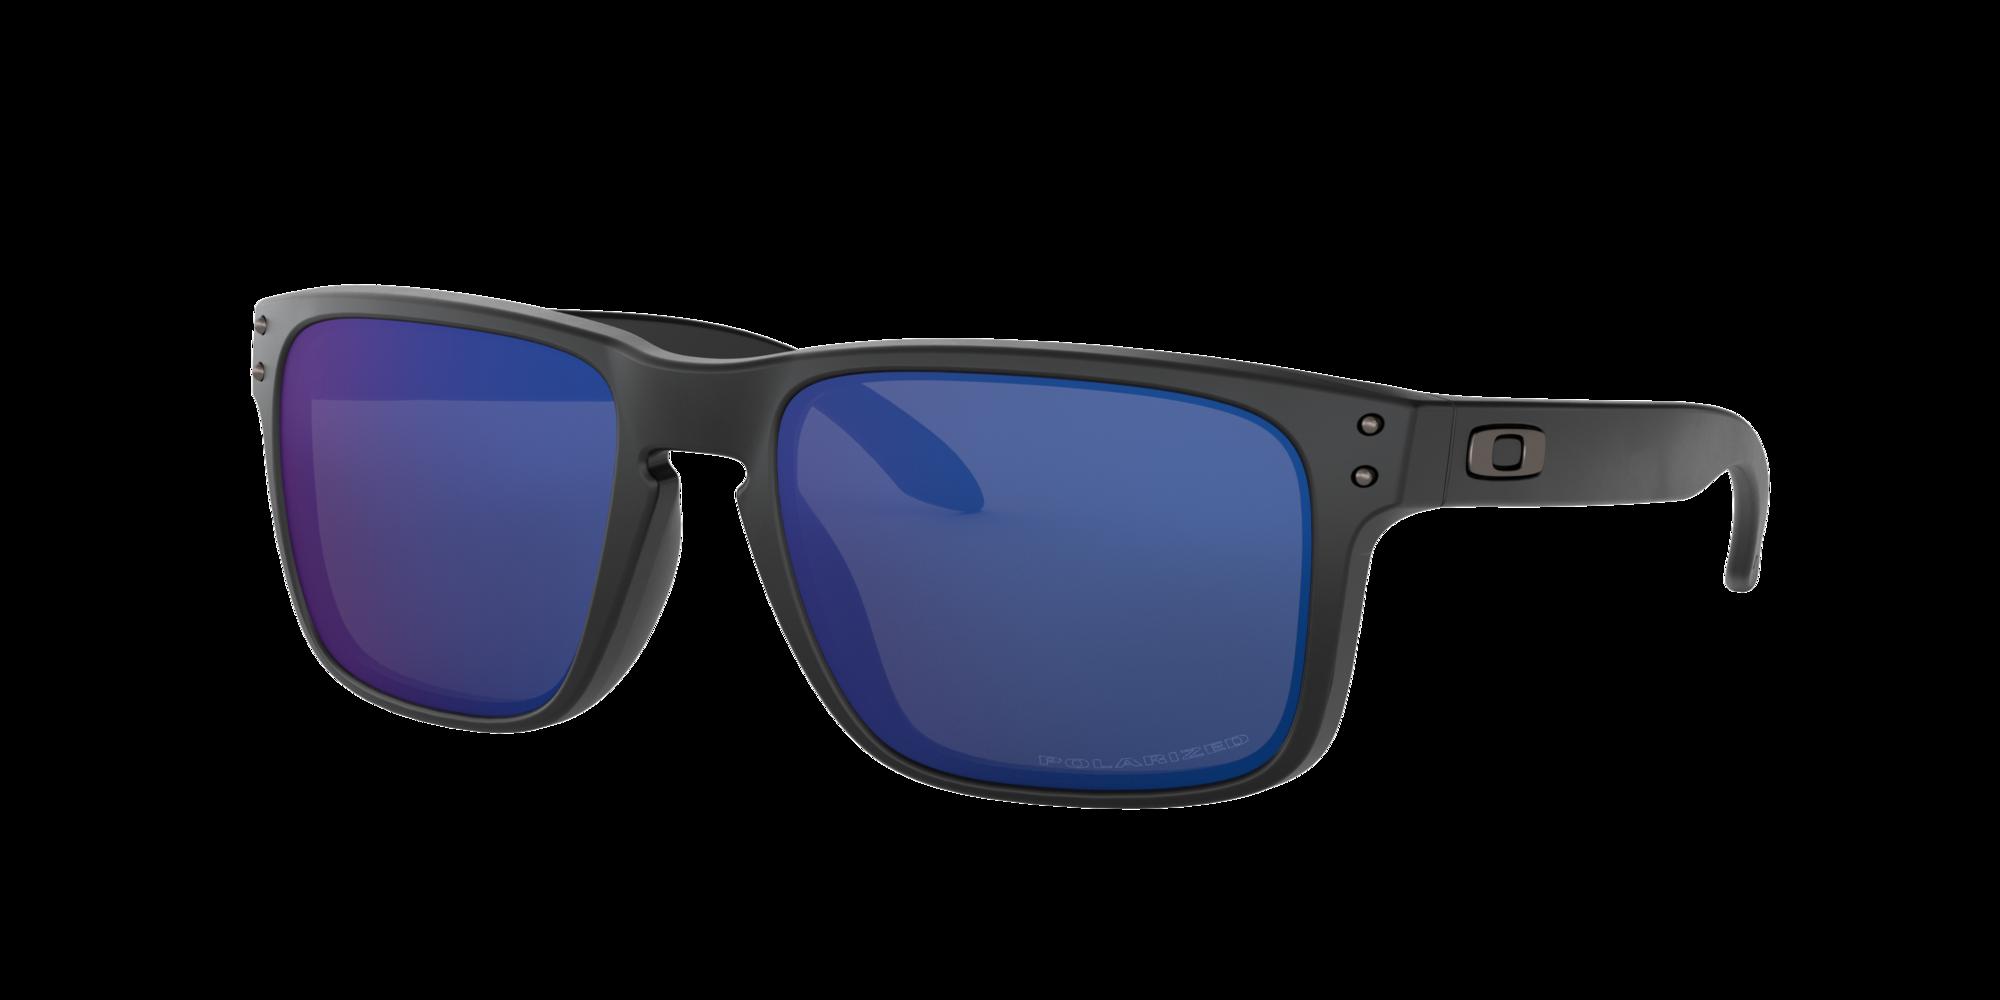 Oakley Unisex  OO9102 Holbrook™ -  Frame color: Negro mate, Lens color: Azul, Size 57-18/137